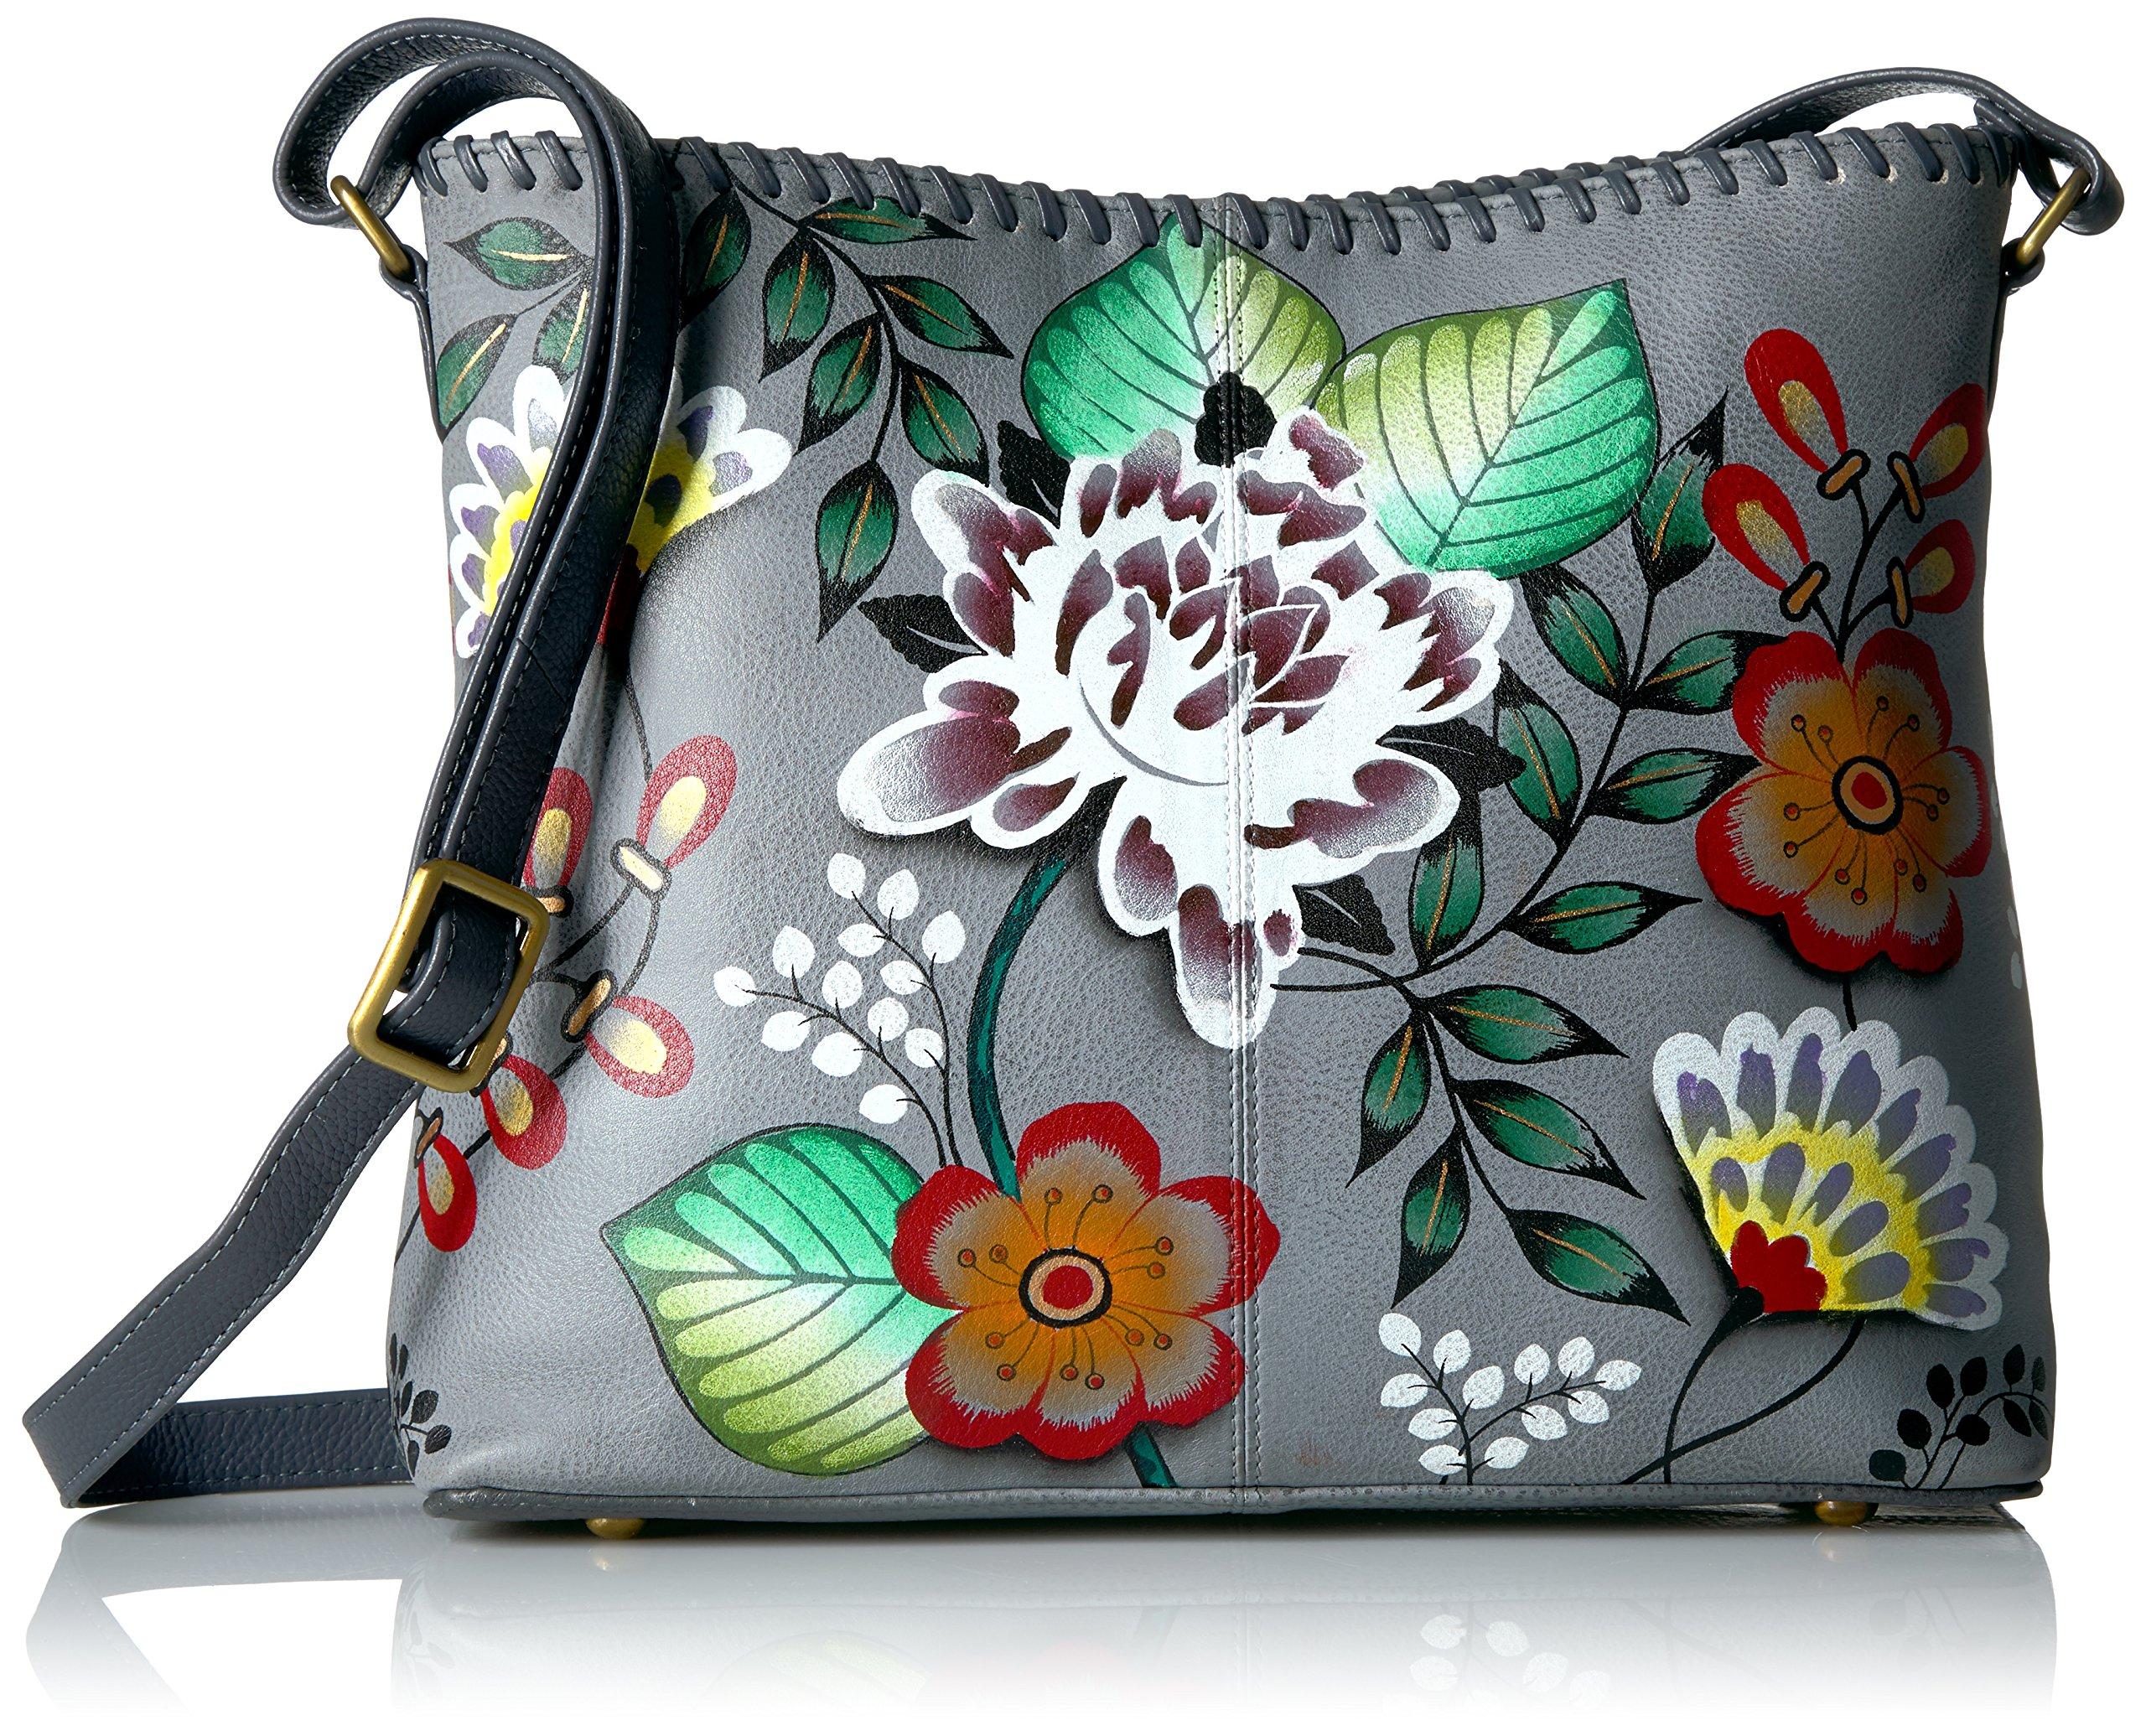 Anna by Anuschka Handpainted Leather Women's Shoulder Bag, Grad-Garden Off Eden